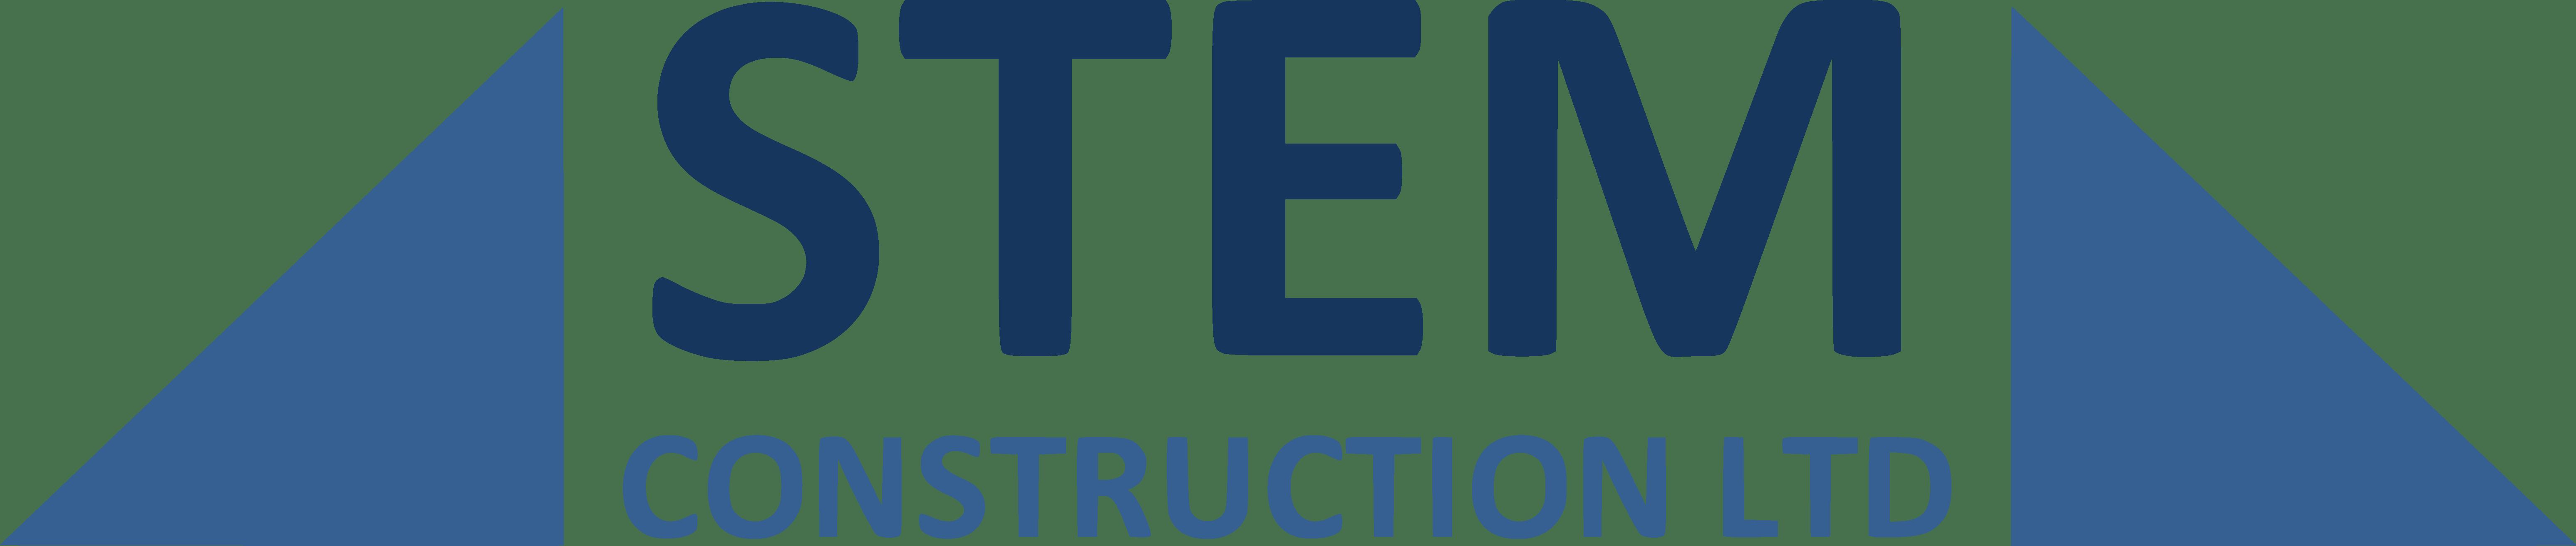 Stem Construction